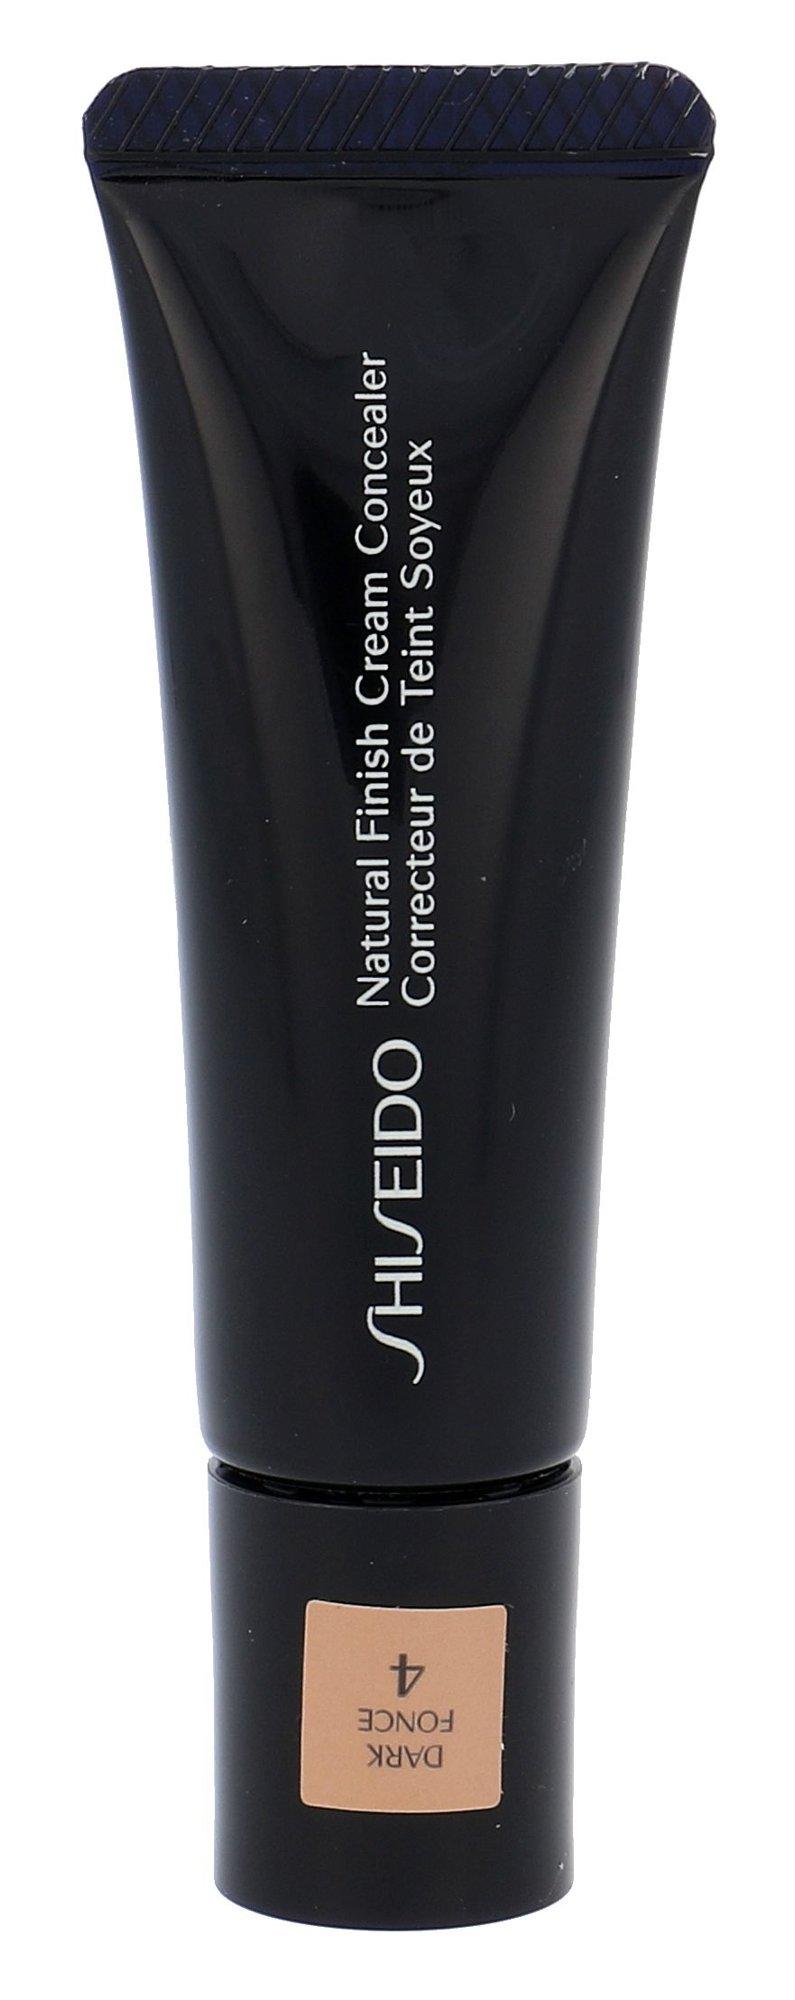 Shiseido Natural Finish Cosmetic 10ml 4 Dark